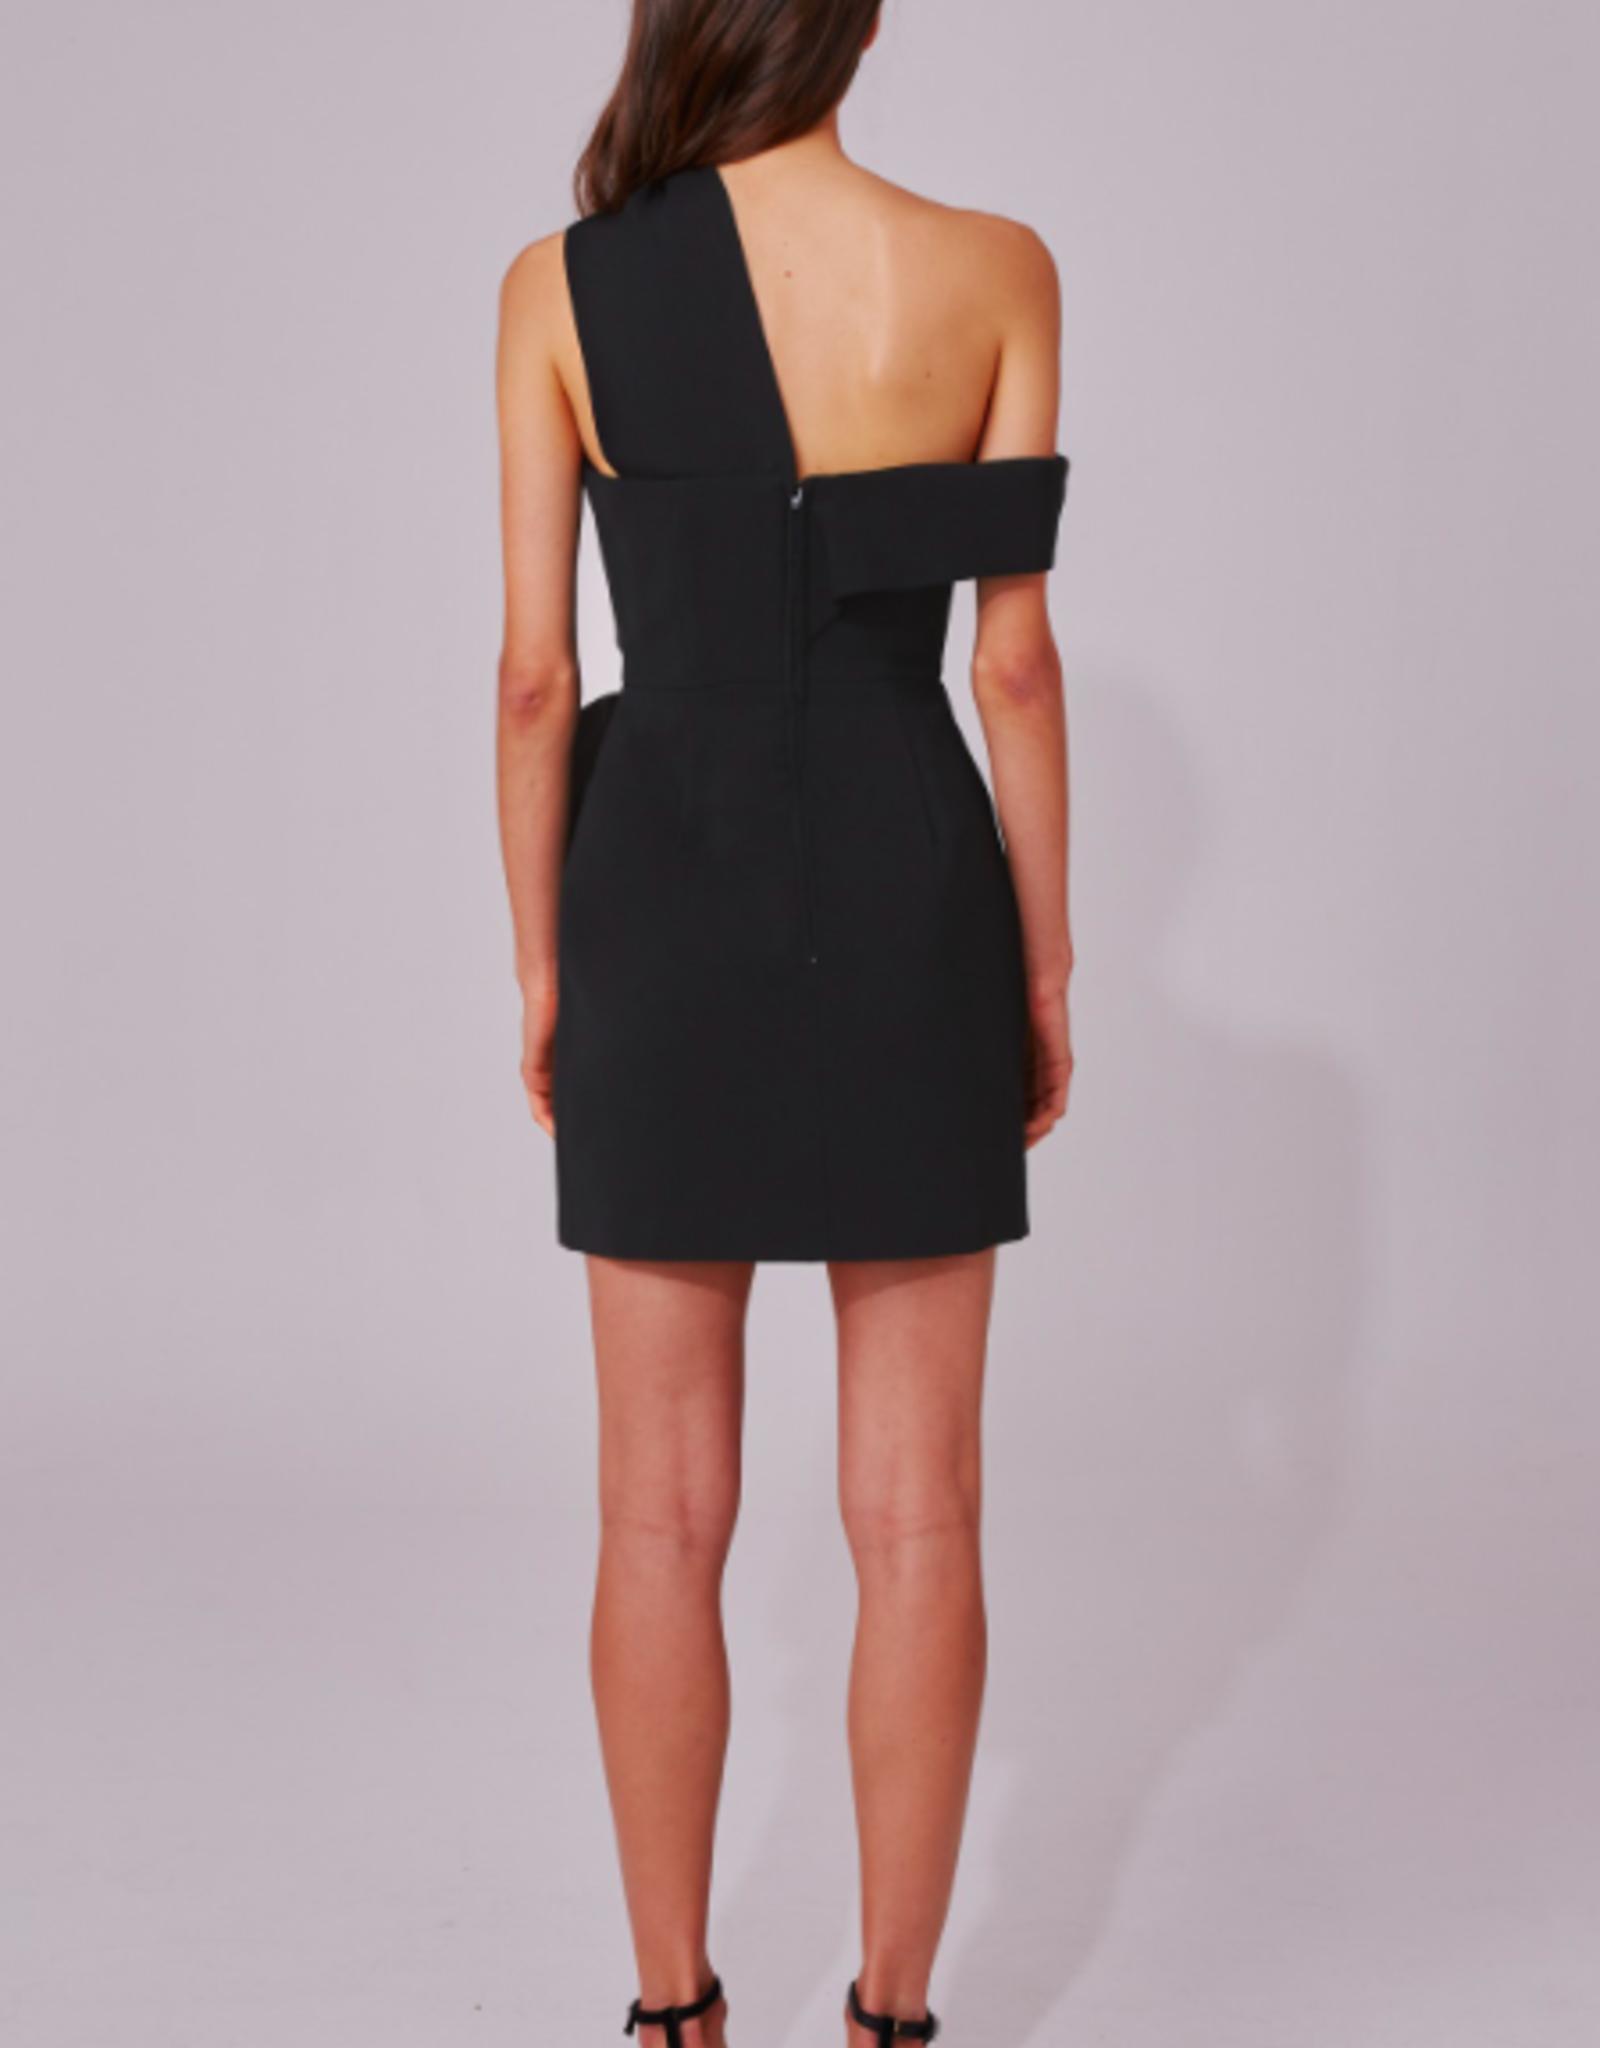 CMEO Caliber Mini Dress